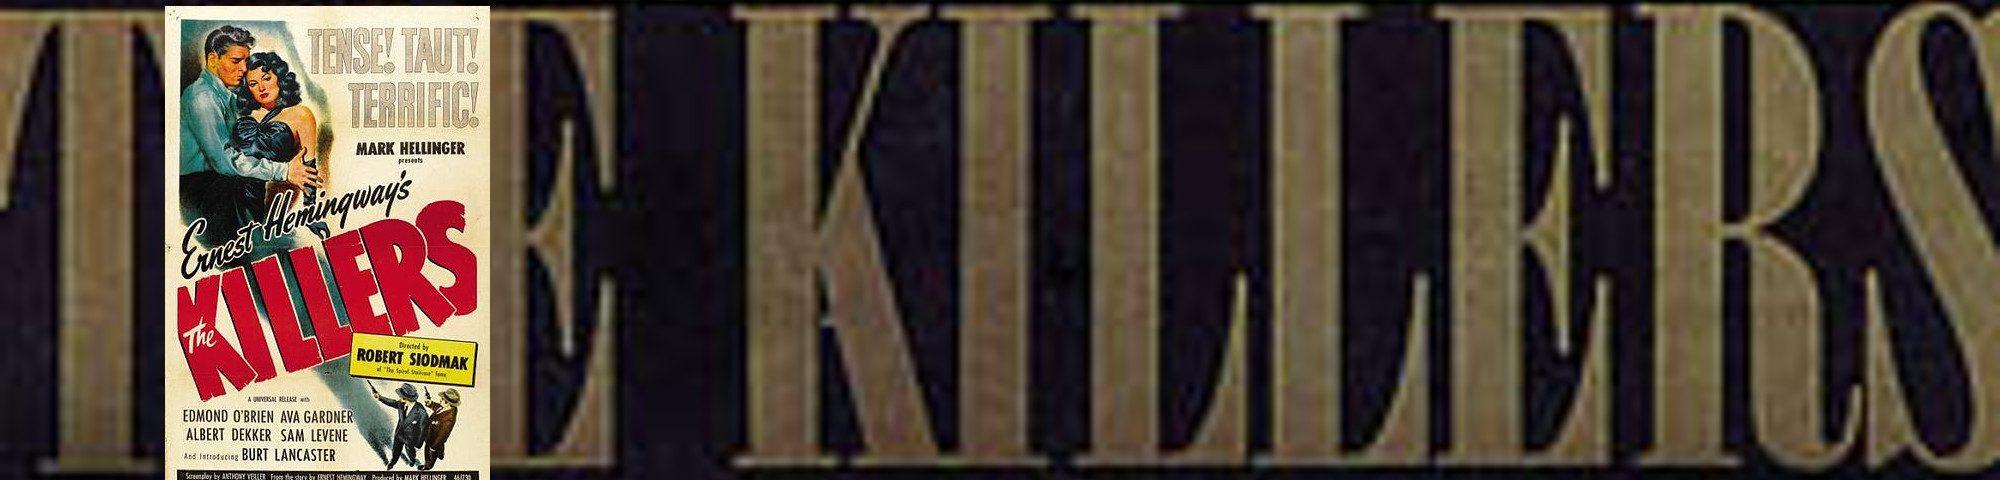 The Killers Header